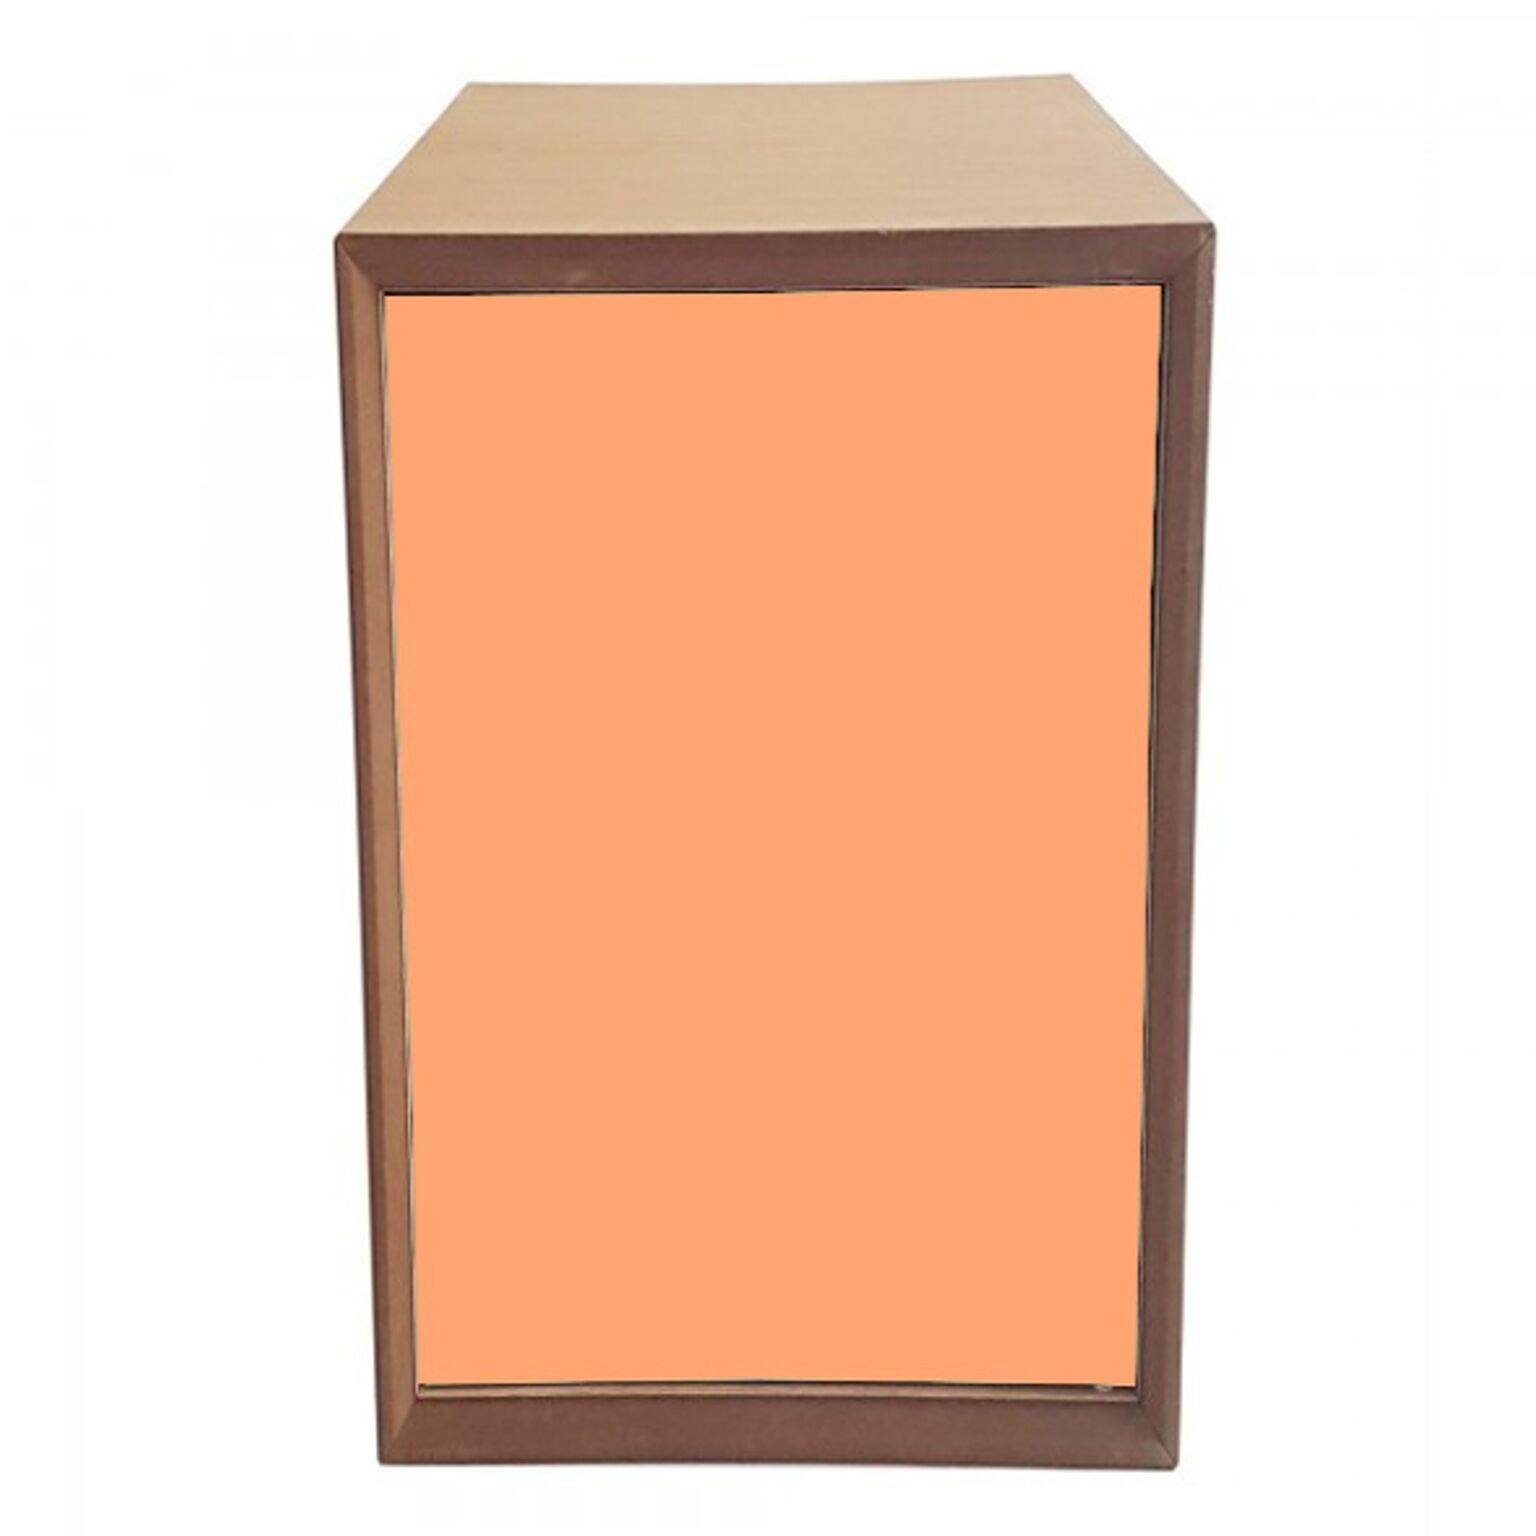 Dulap modular Pixel Orange / Wooden l40xA40xH80 cm